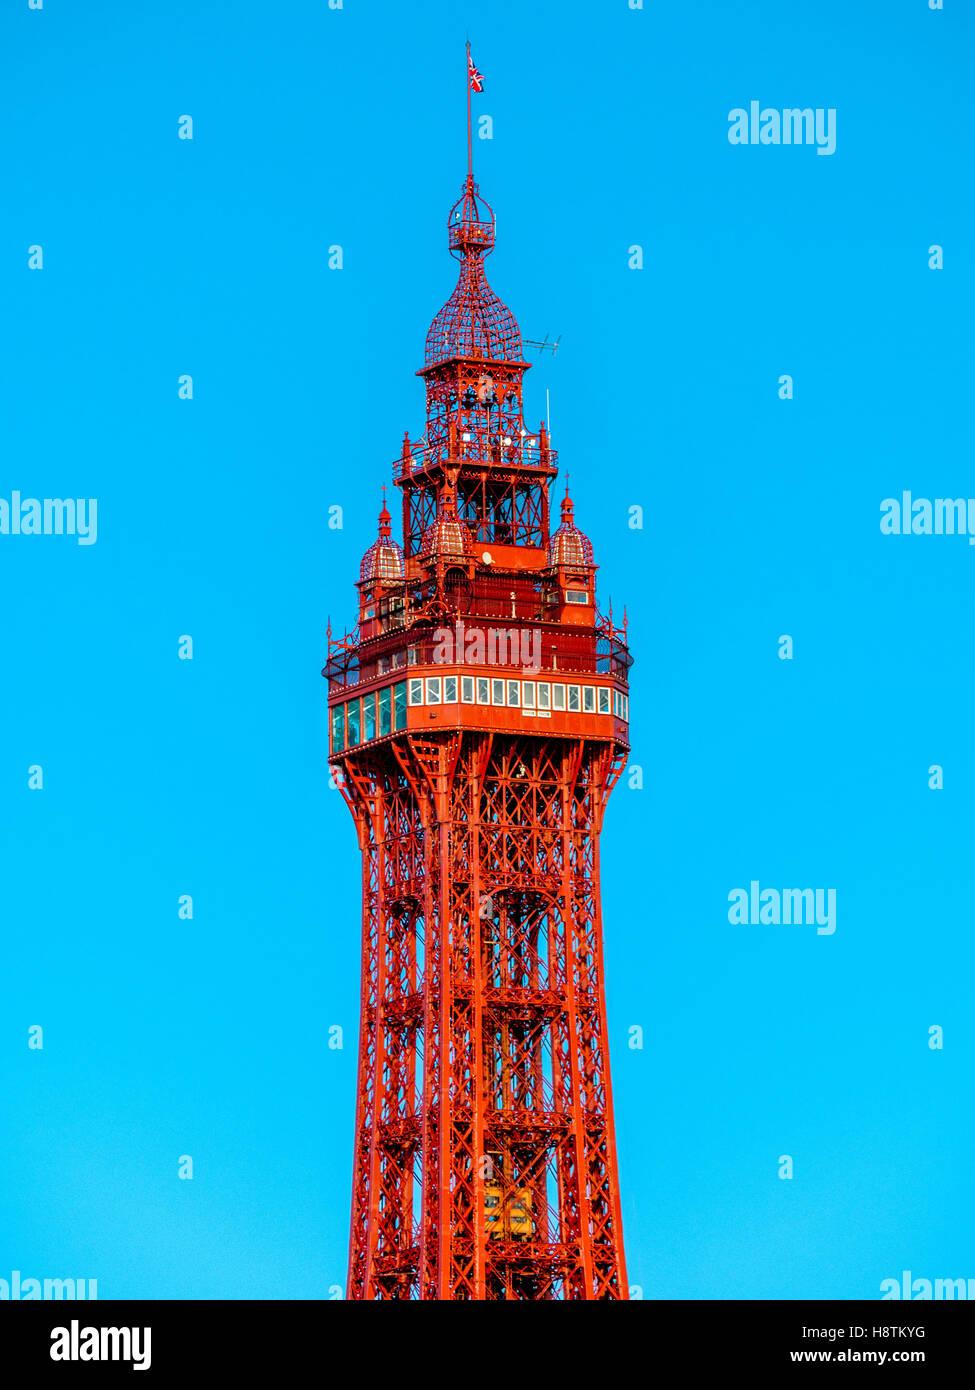 La tour de Blackpool, Lancashire, Royaume-Uni. Photo Stock